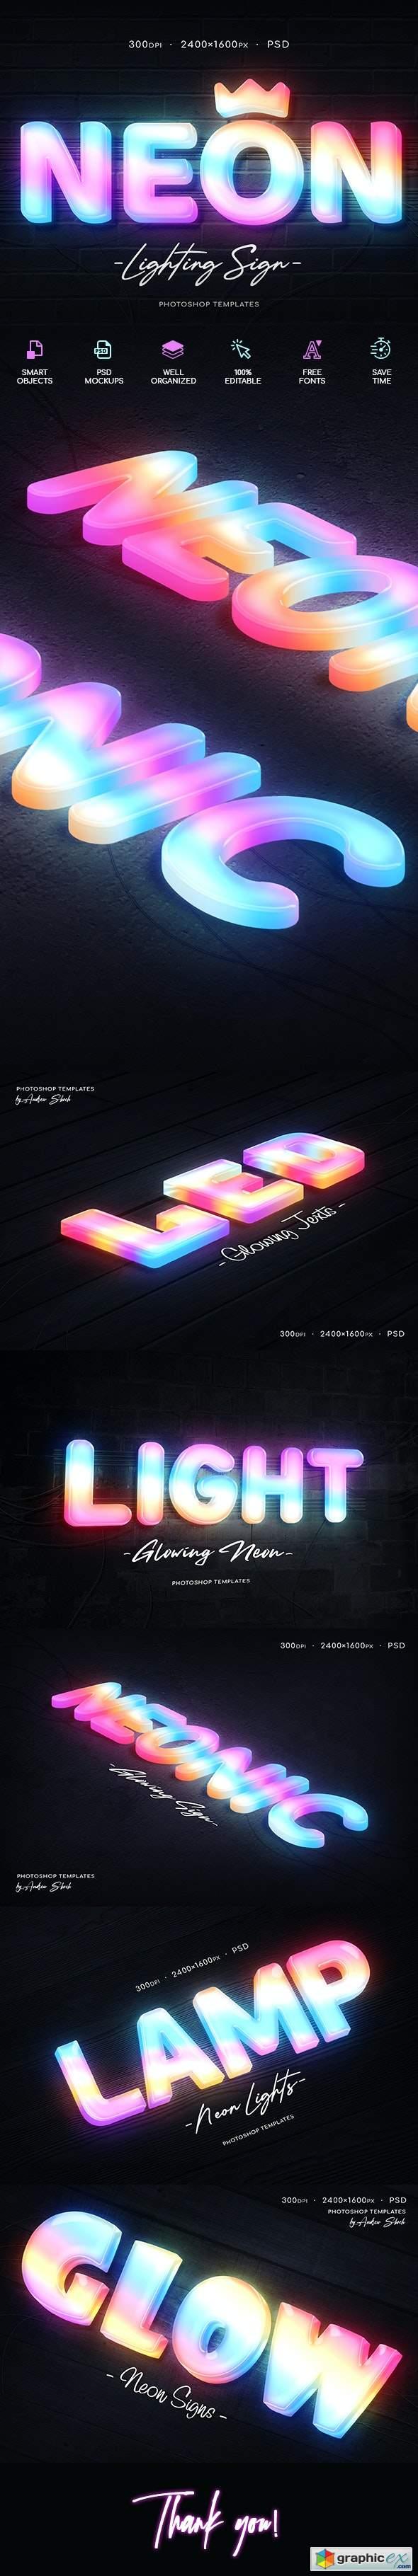 Neon Wall Sign Creator 29931299